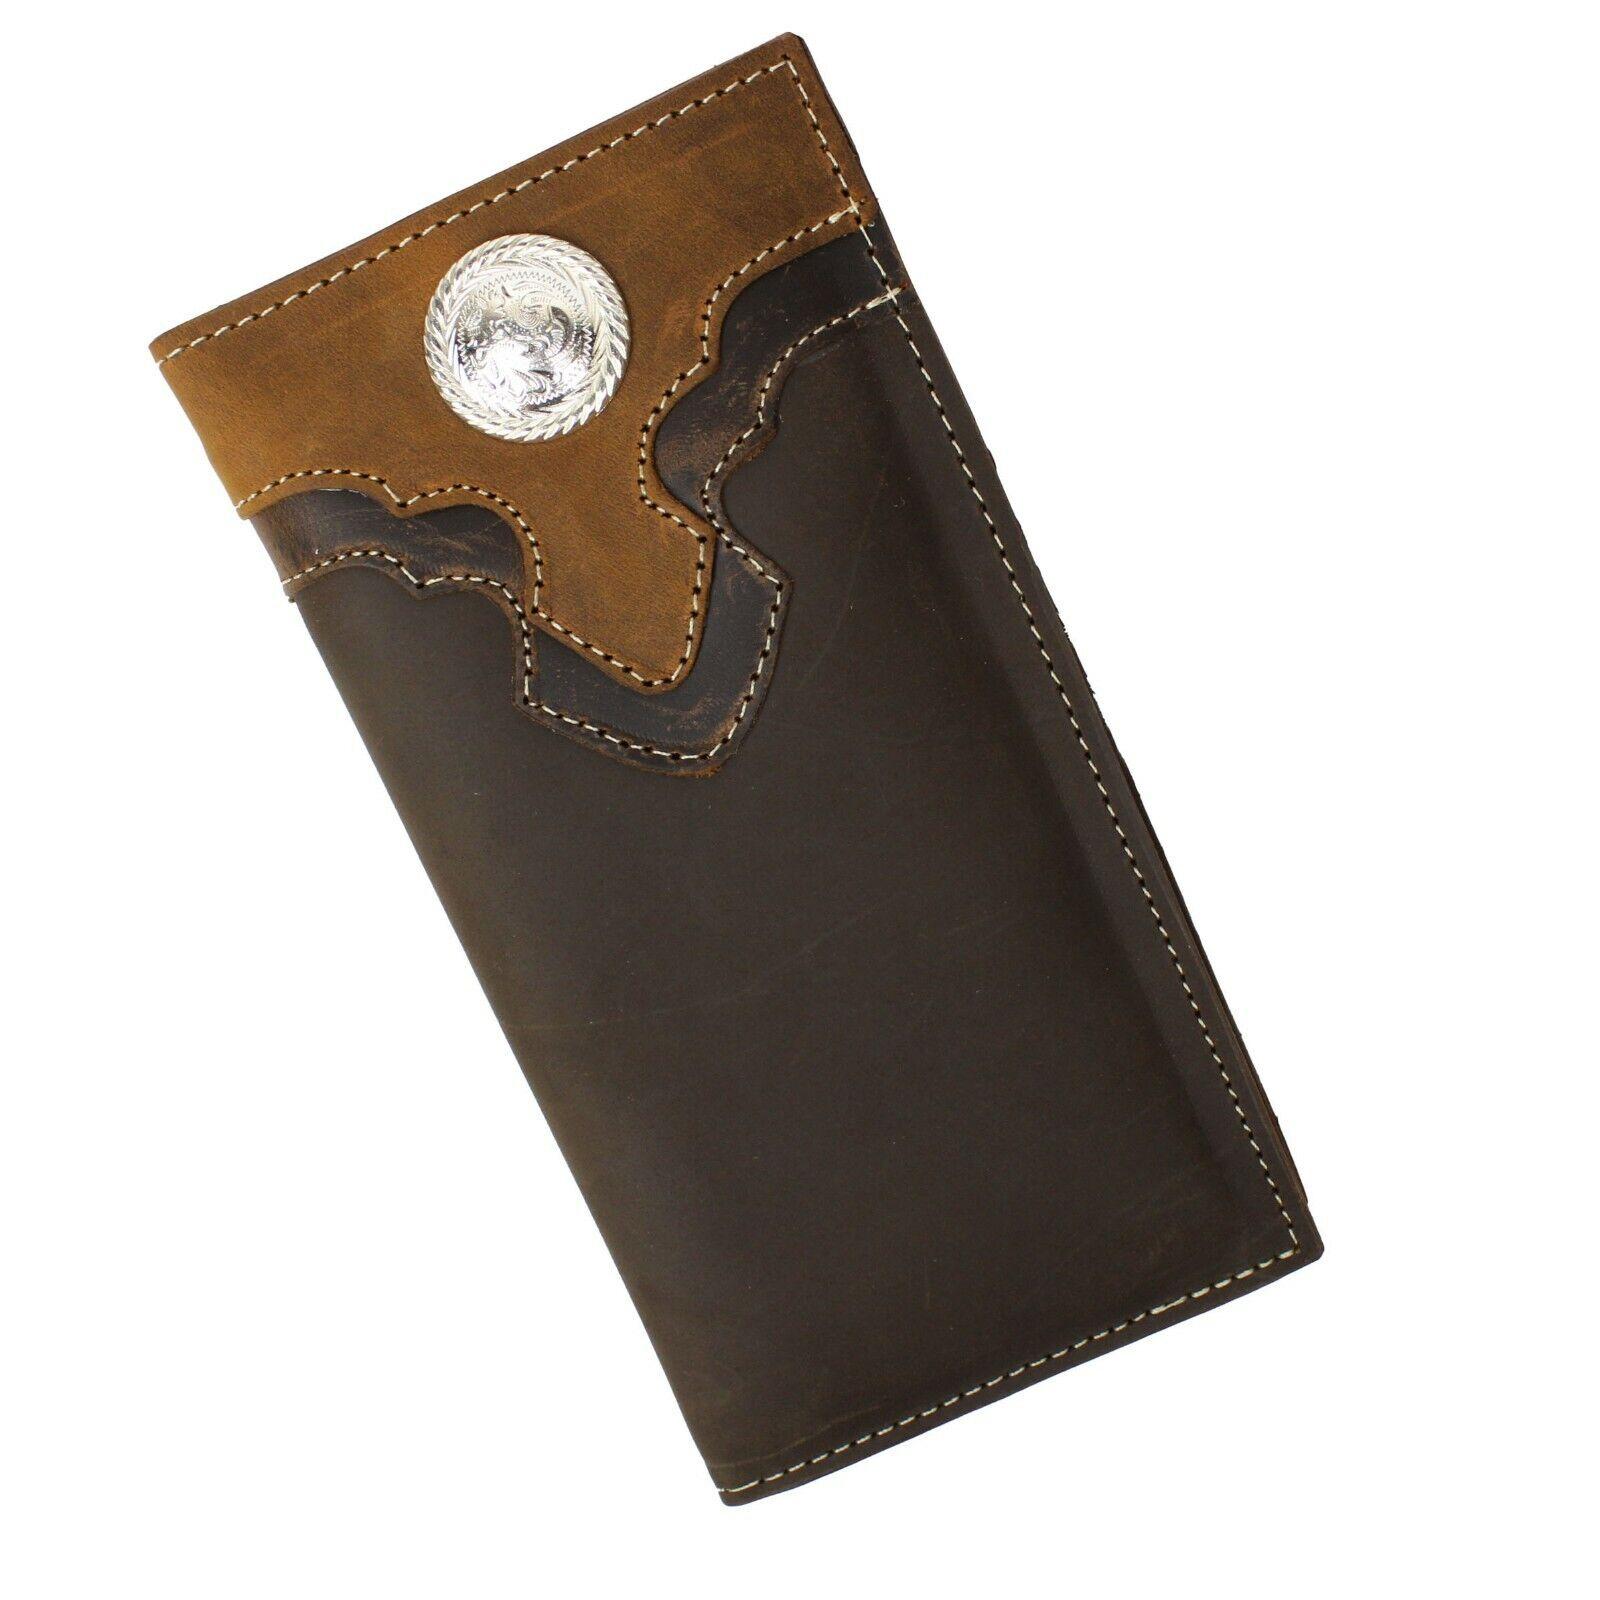 Mens Long Genuine Leather Wallet Western Bi-Fold Check Book Cowboy Rodeo Wallet